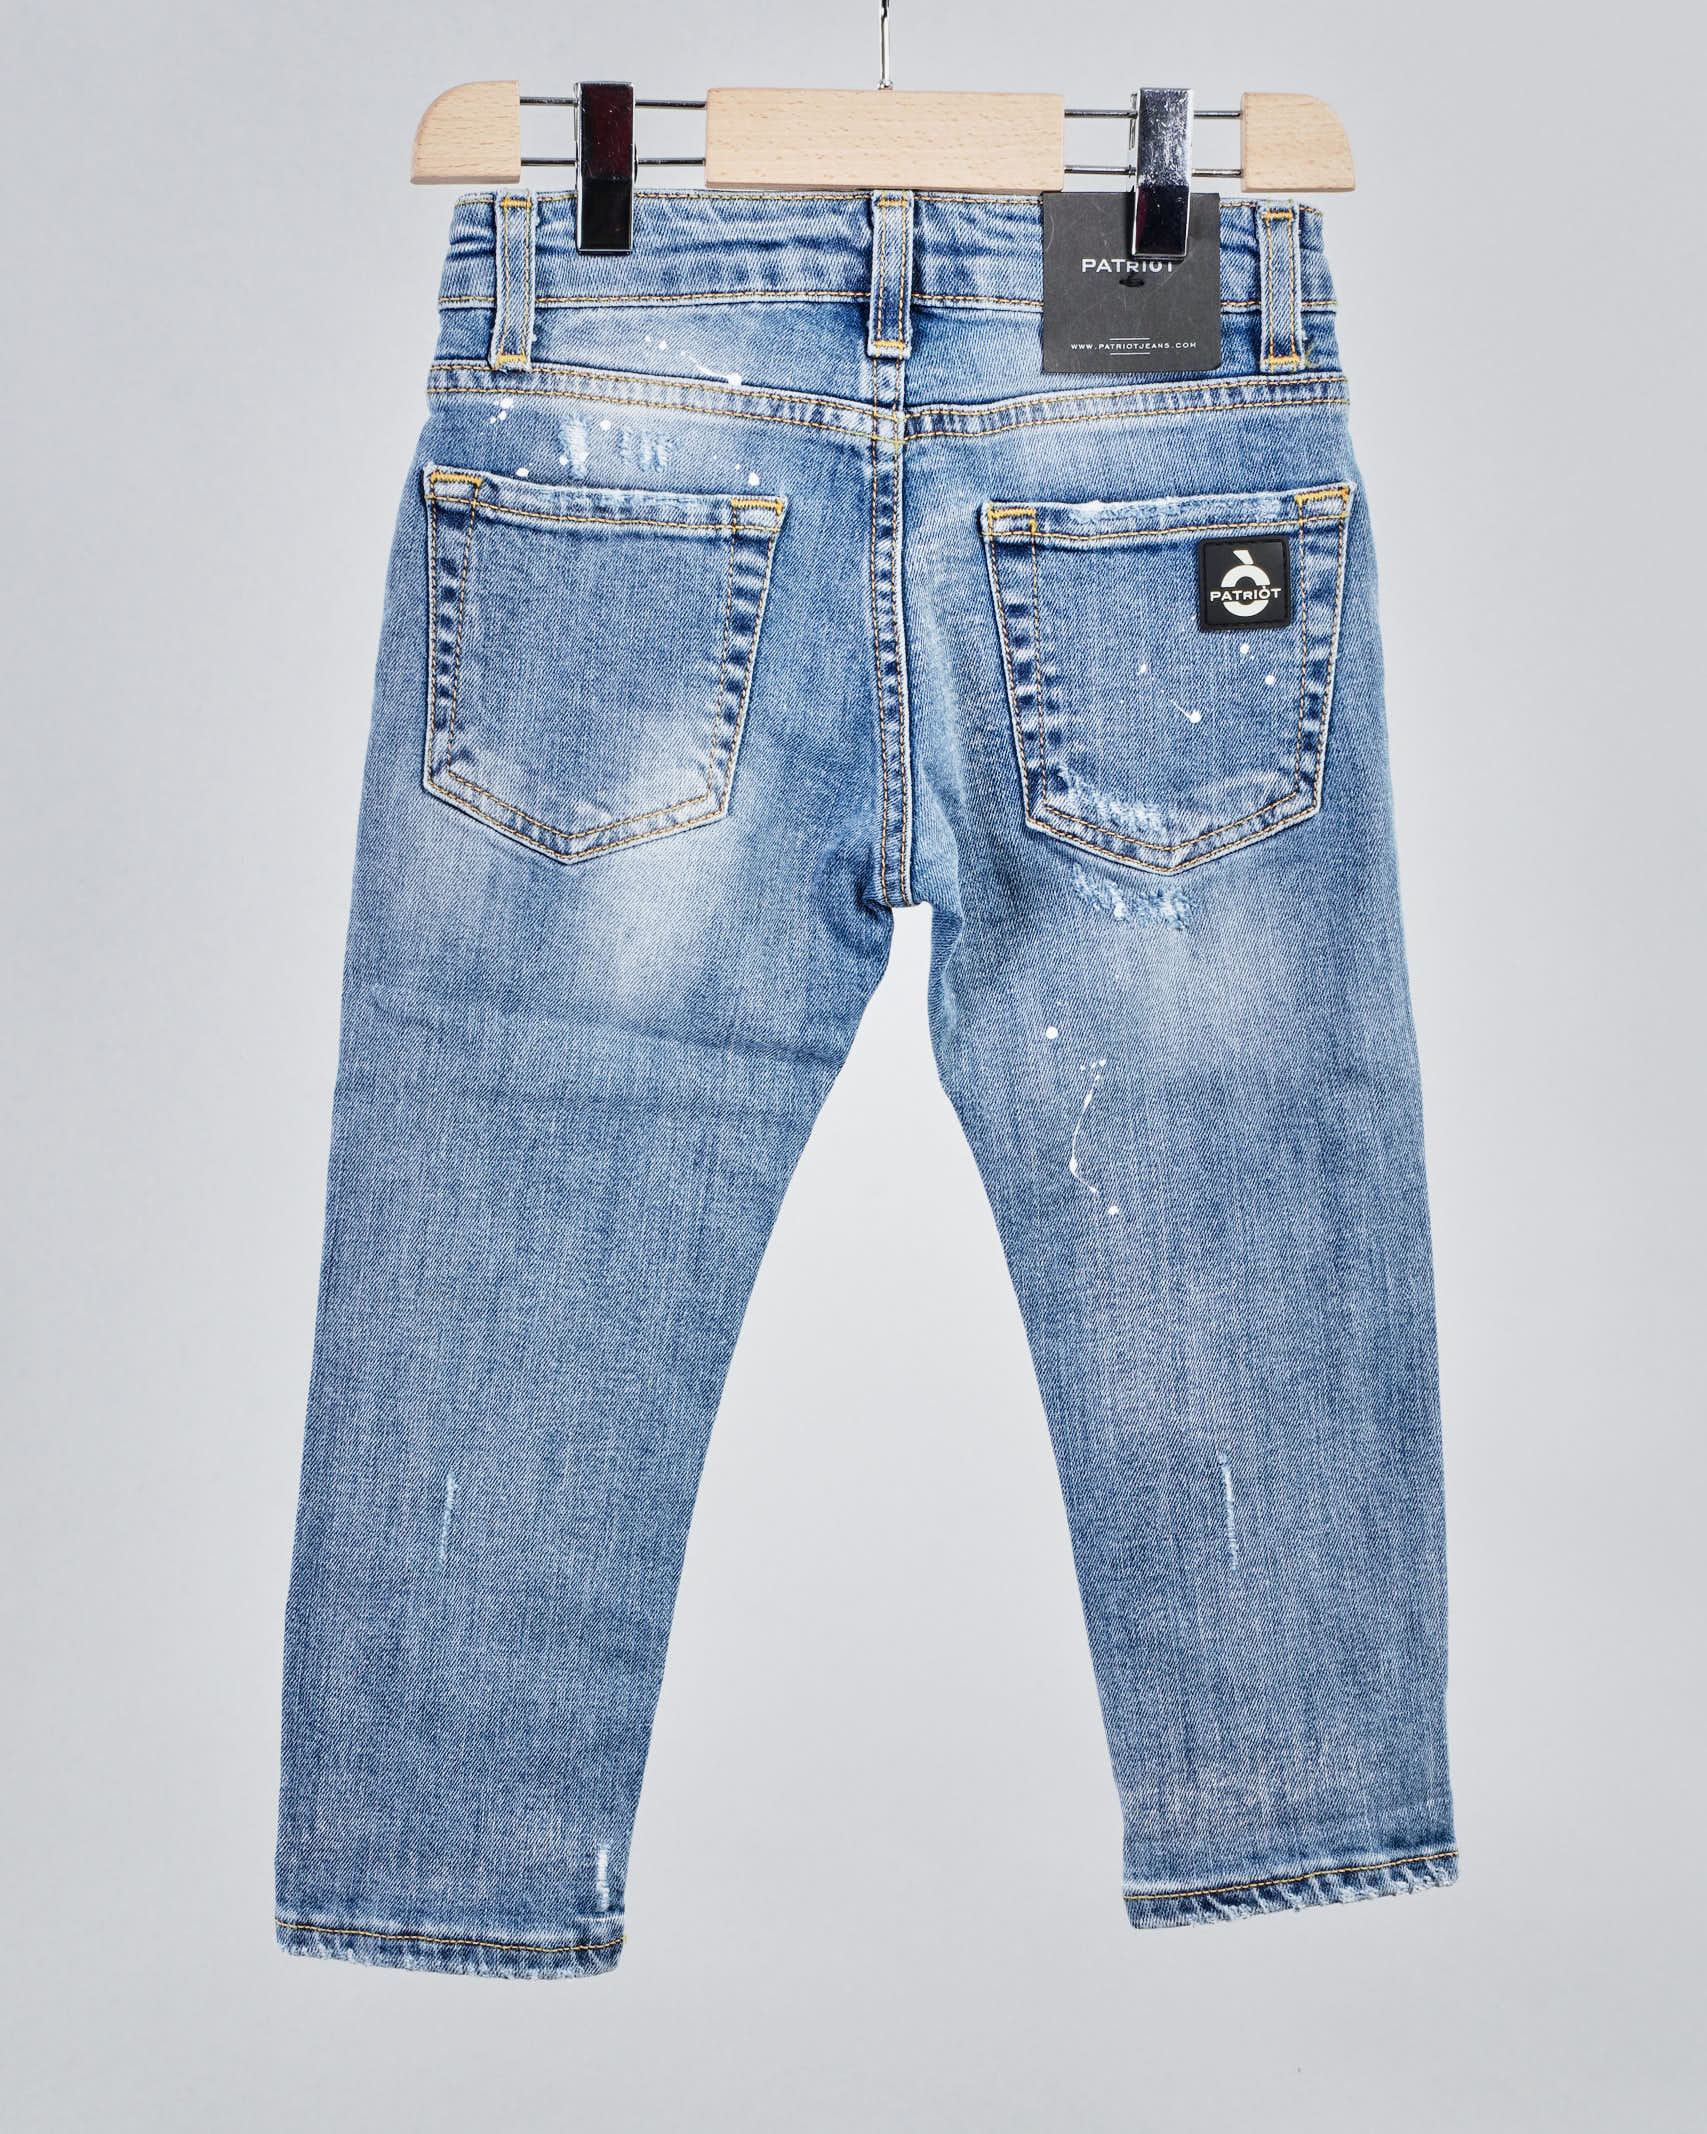 Jeans Patriot PATRIOT   Jeans   PB1068DENIM